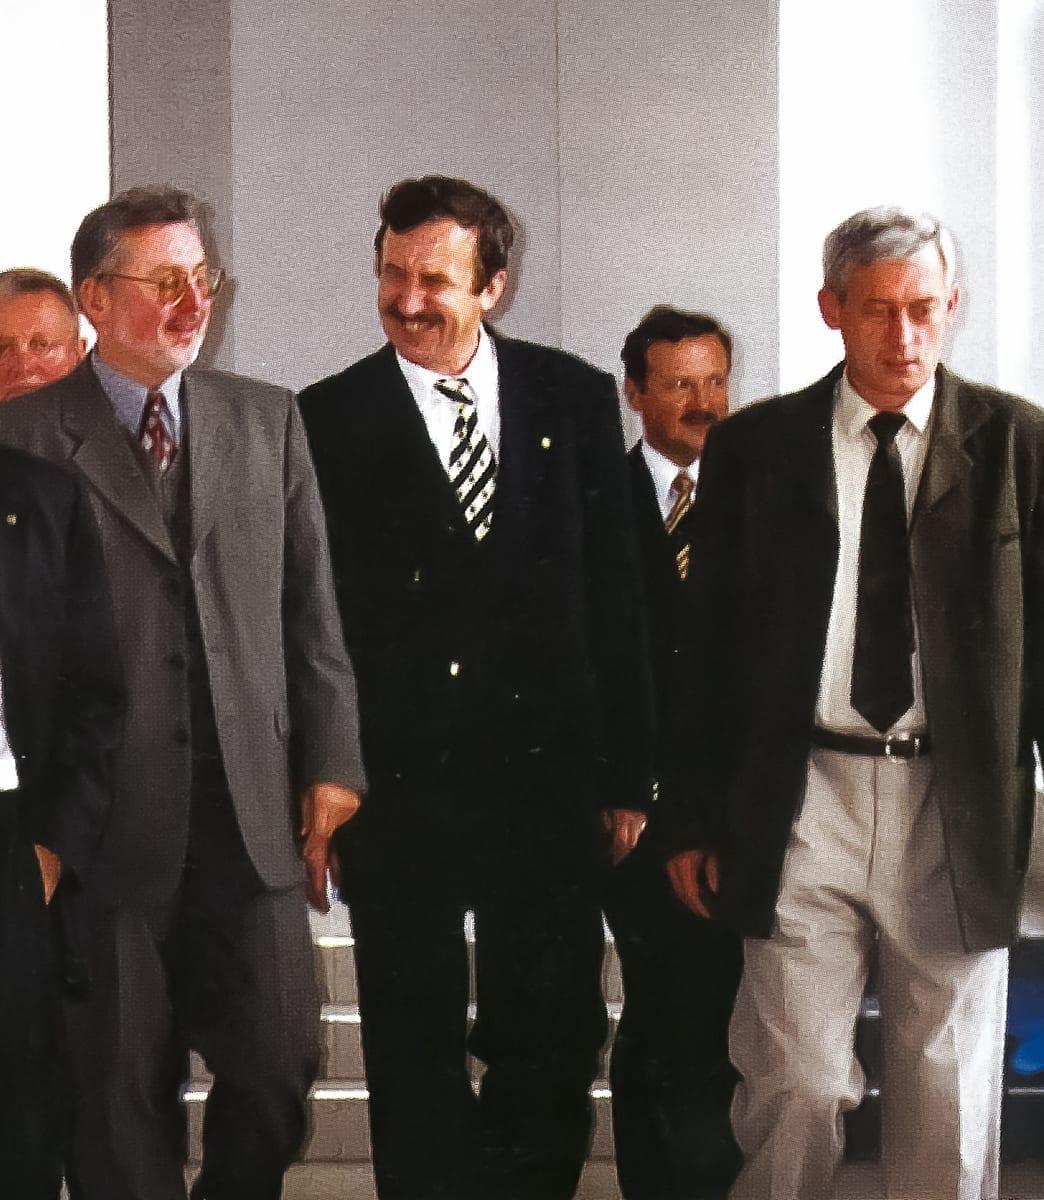 1999 L4 - 1-2